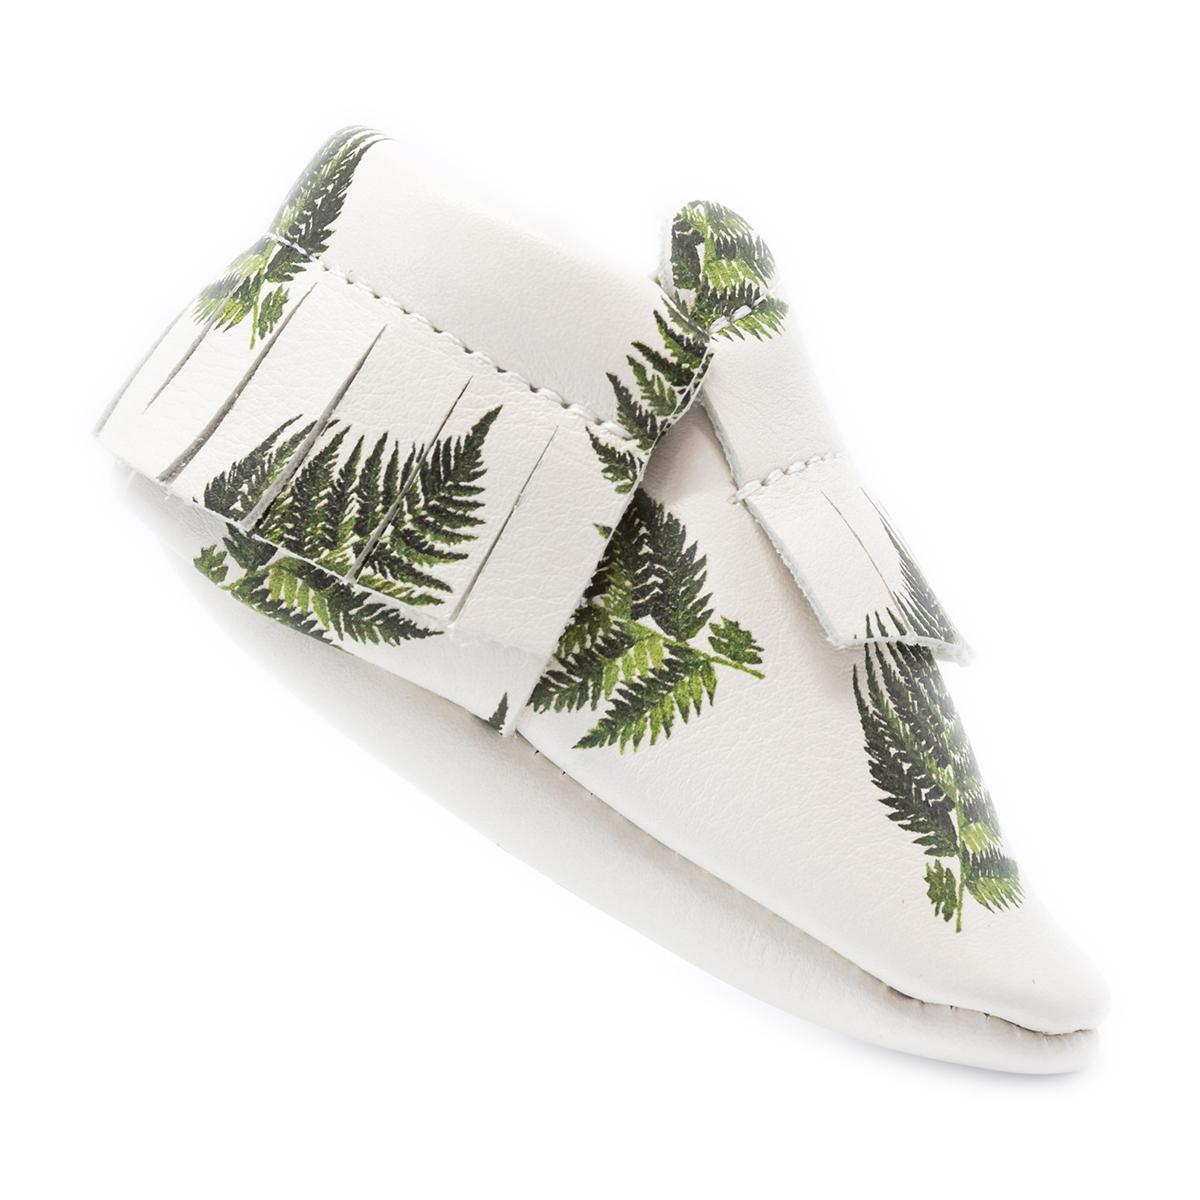 Chaussons & Chaussures Chaussons Athyrium Filix - 18/19 Chaussons Athyrium Filix - 18/19